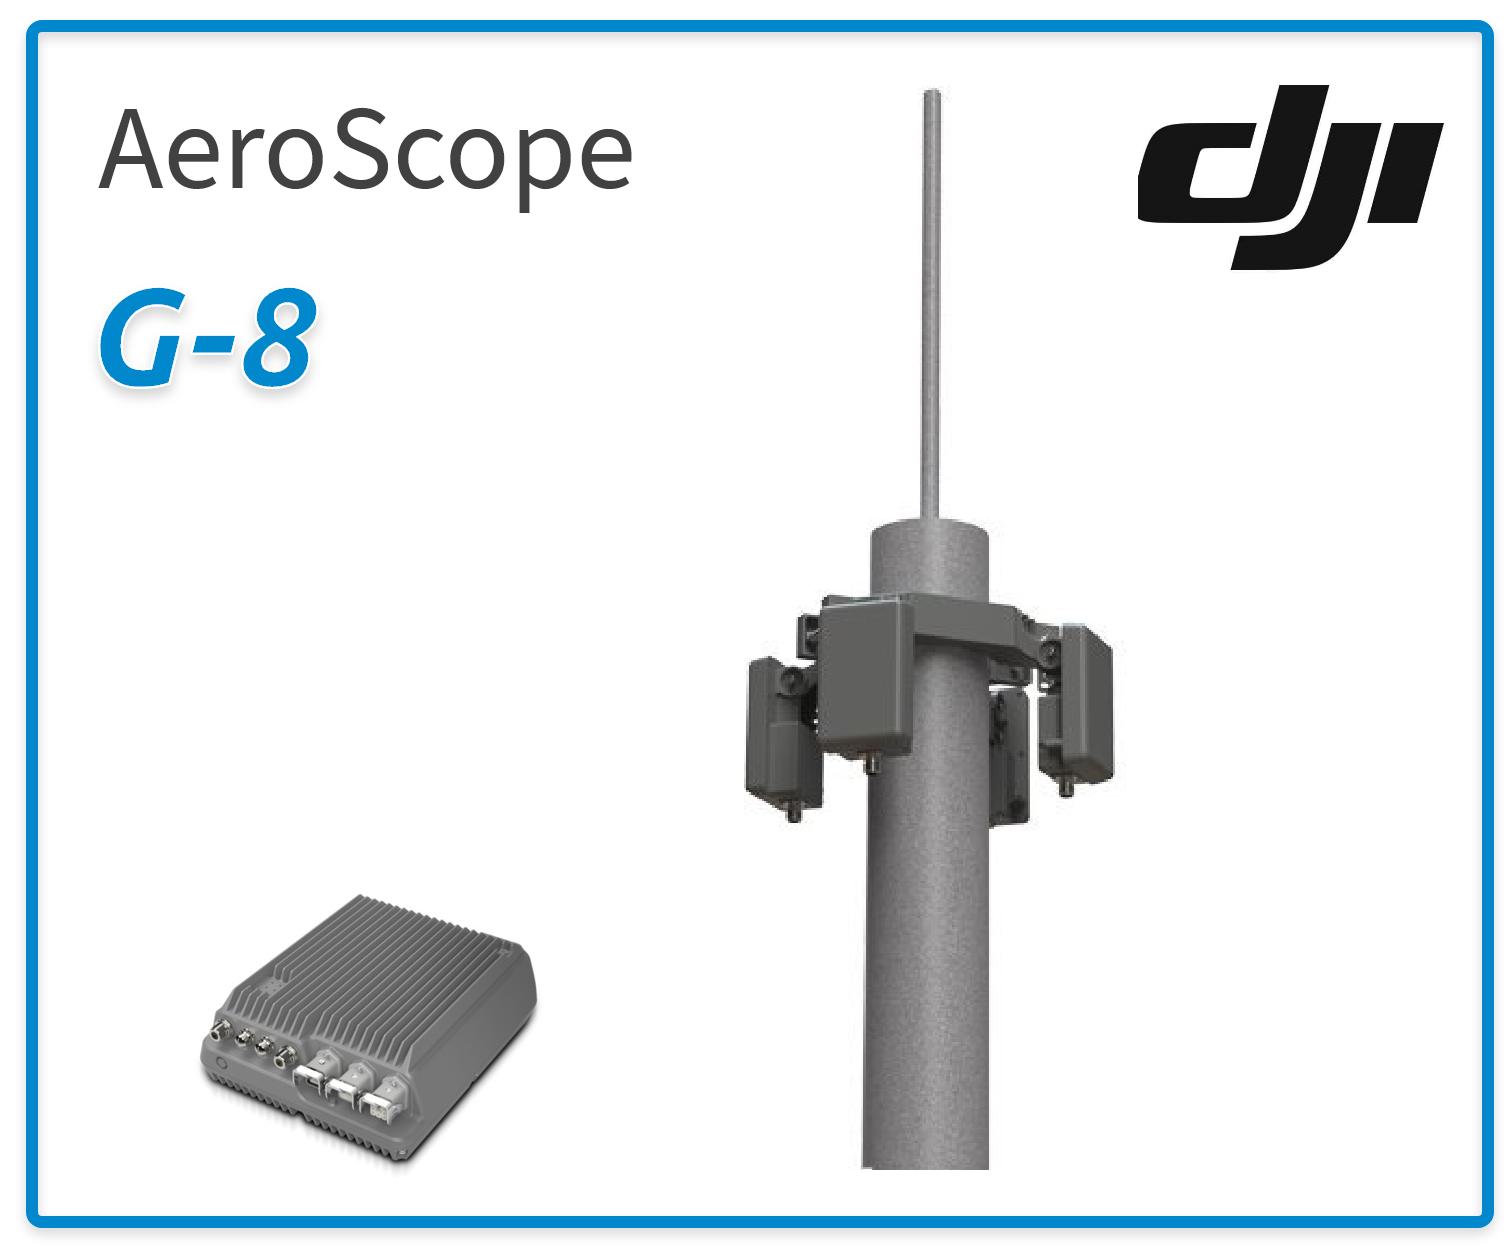 dji aeroscope g-8 drone detection radar